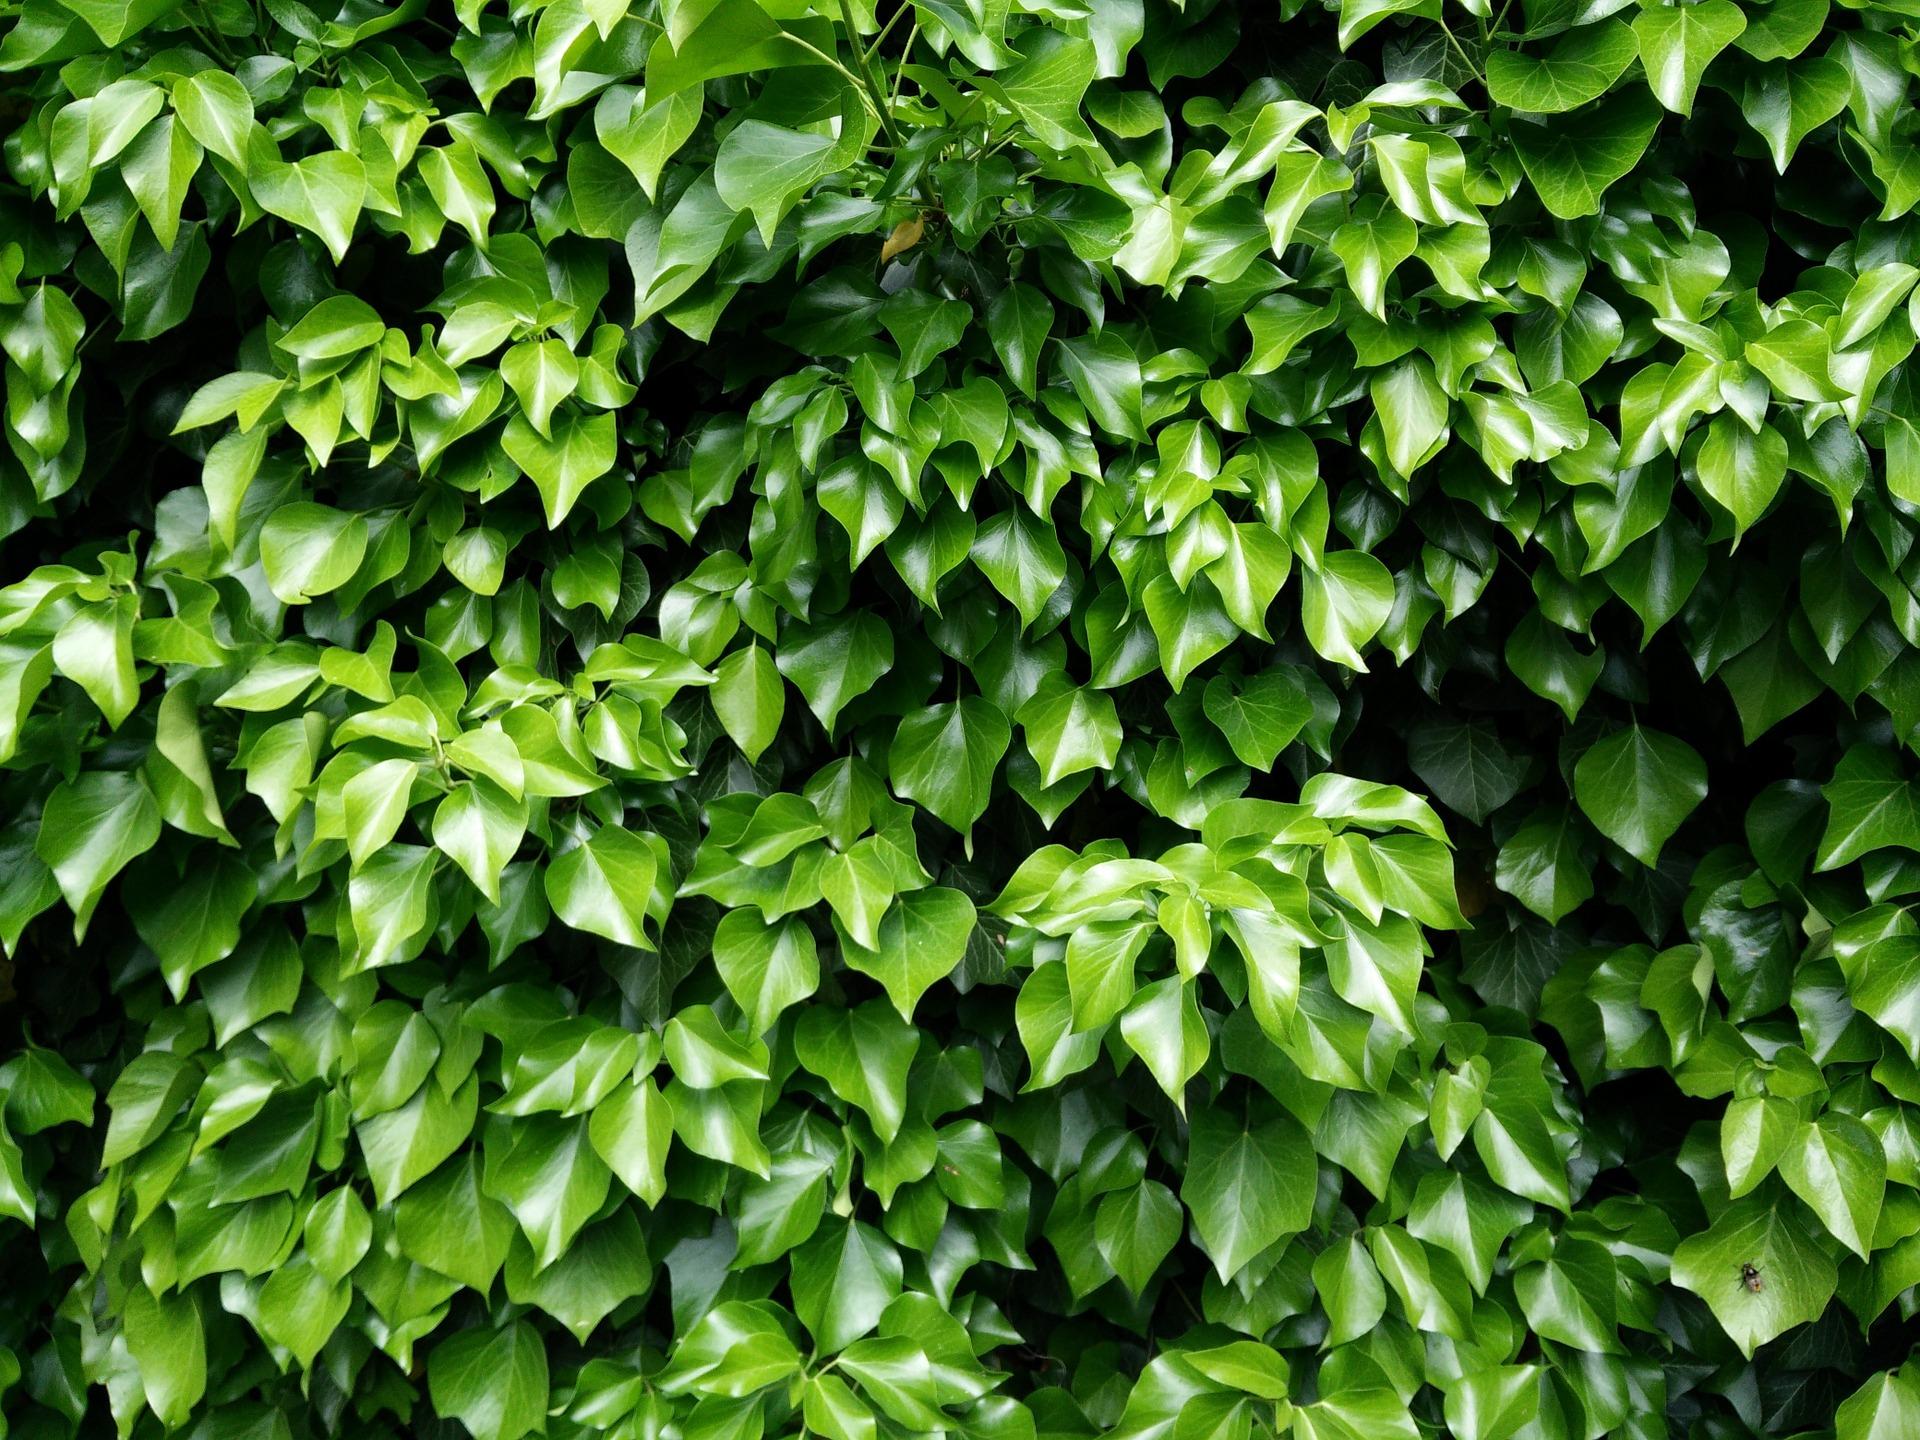 ivy-783084_1920.jpg